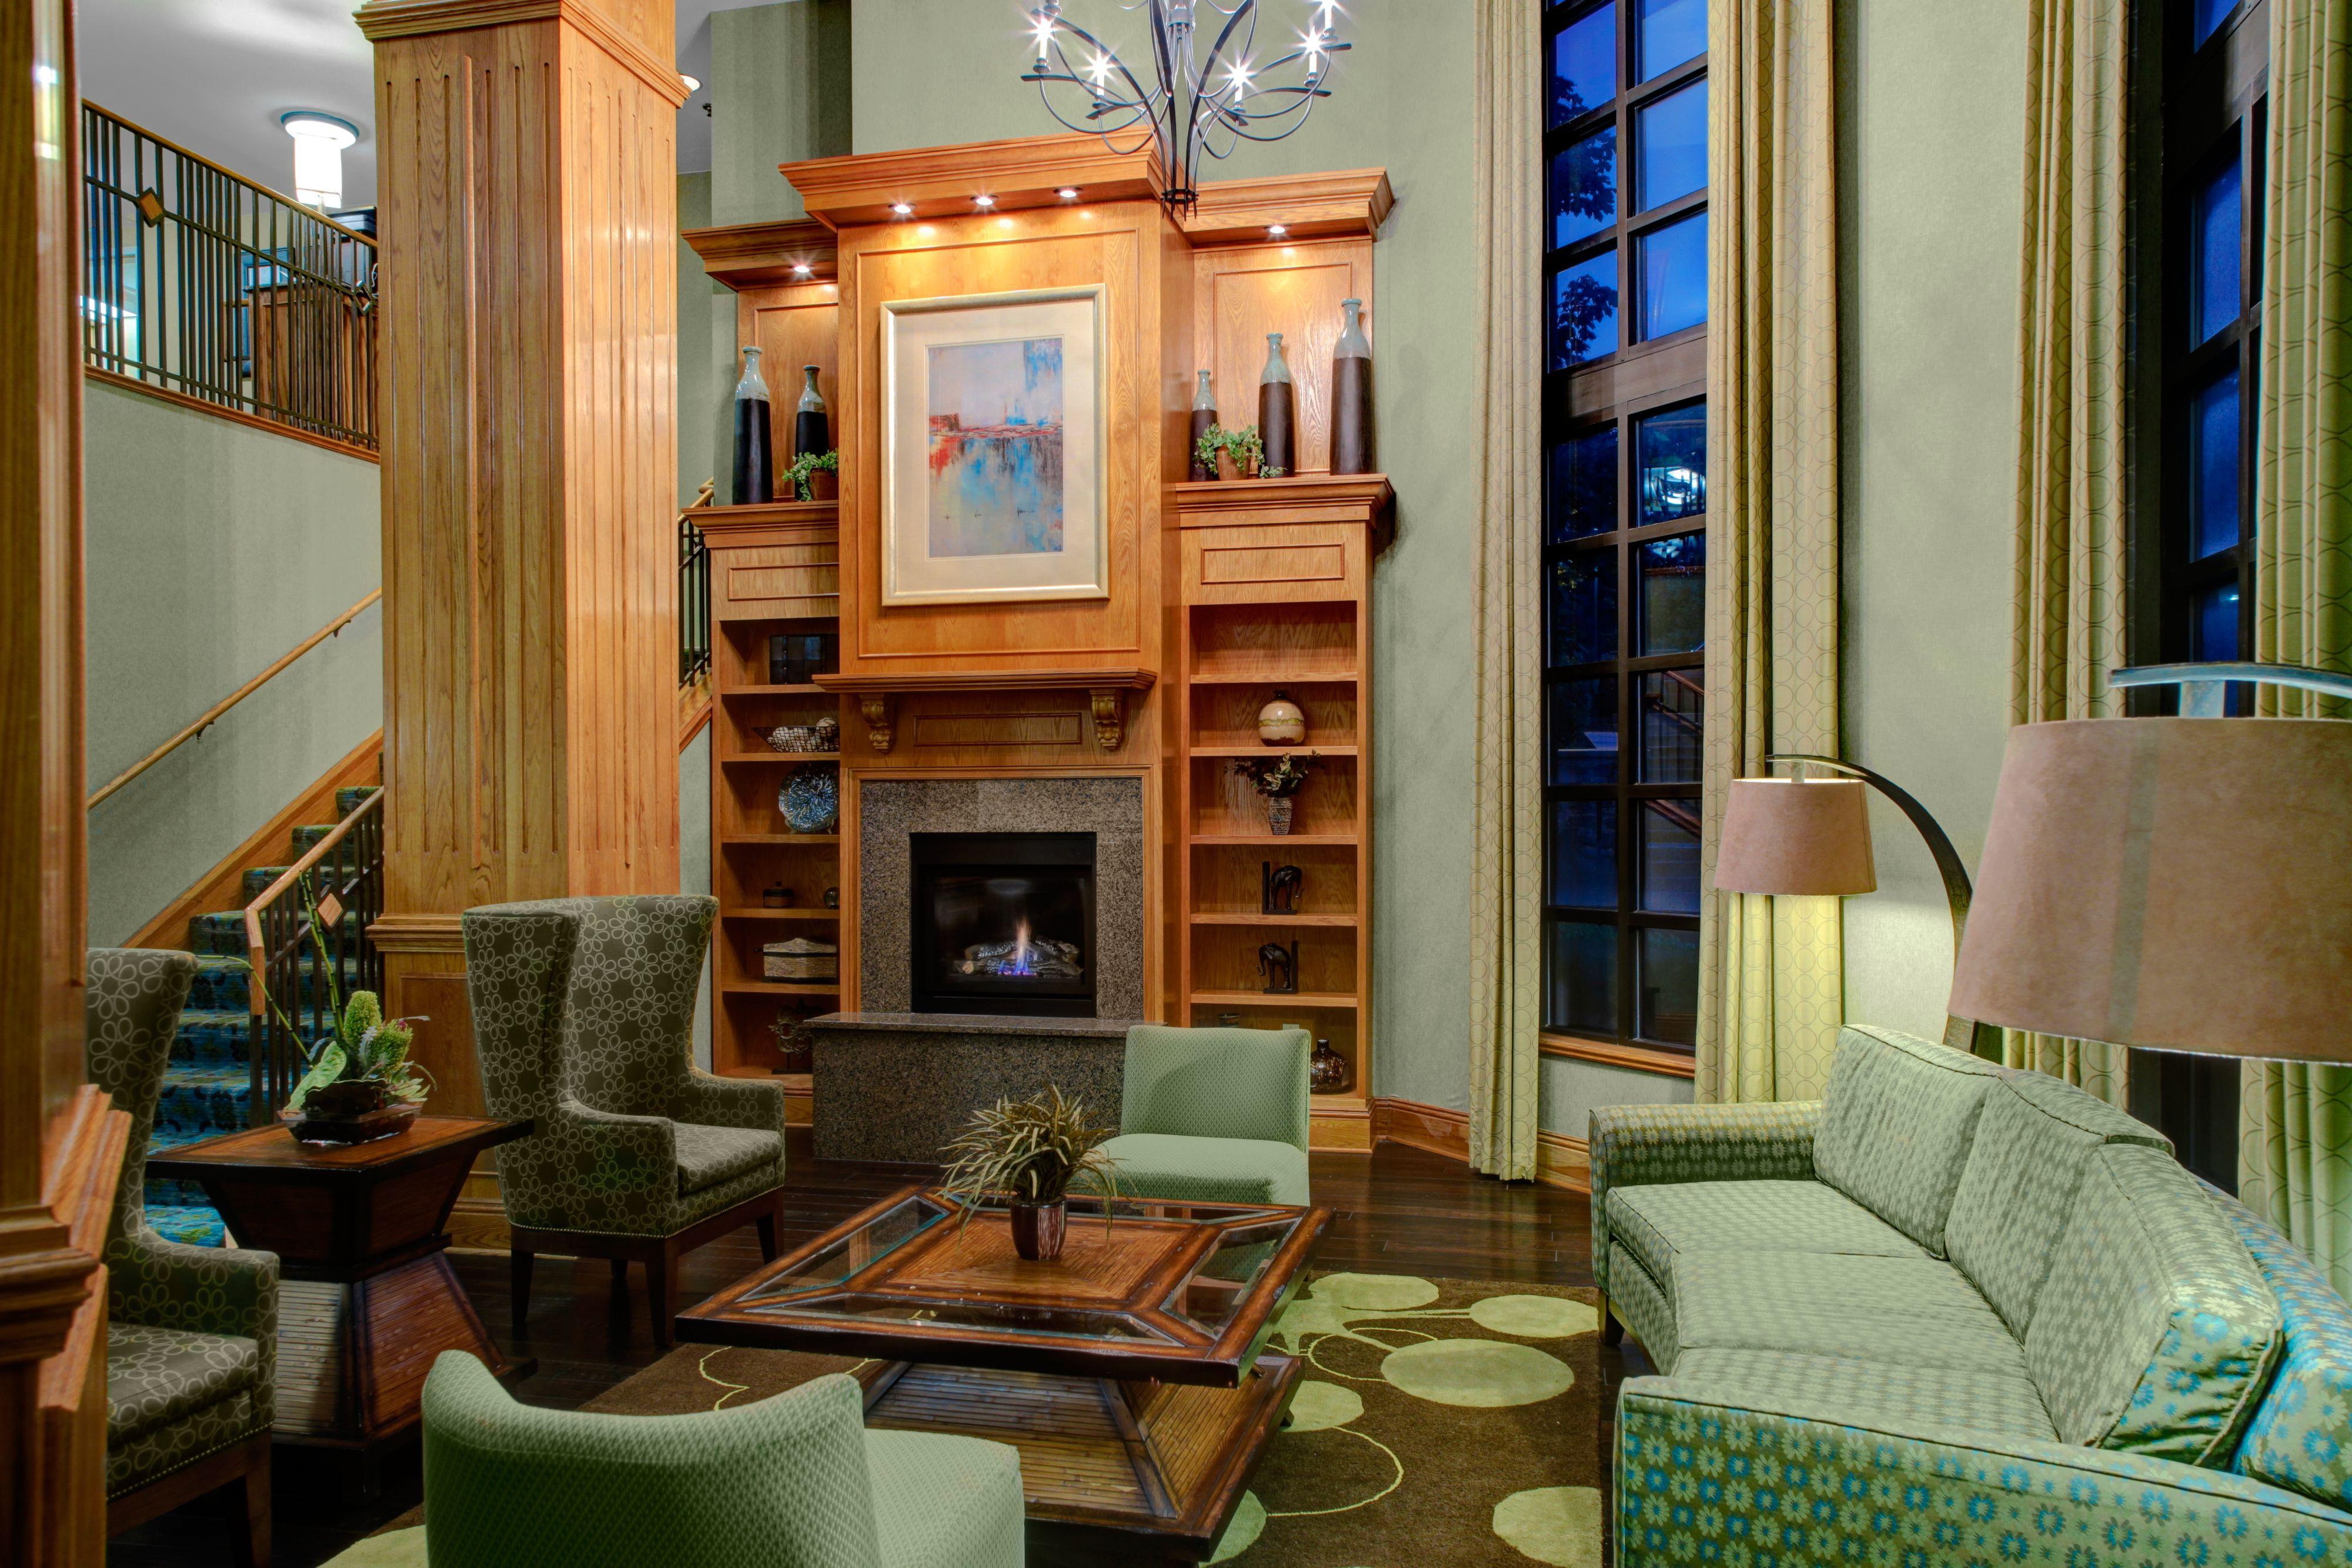 Holiday Inn Express & Suites Atlanta Buckhead image 4